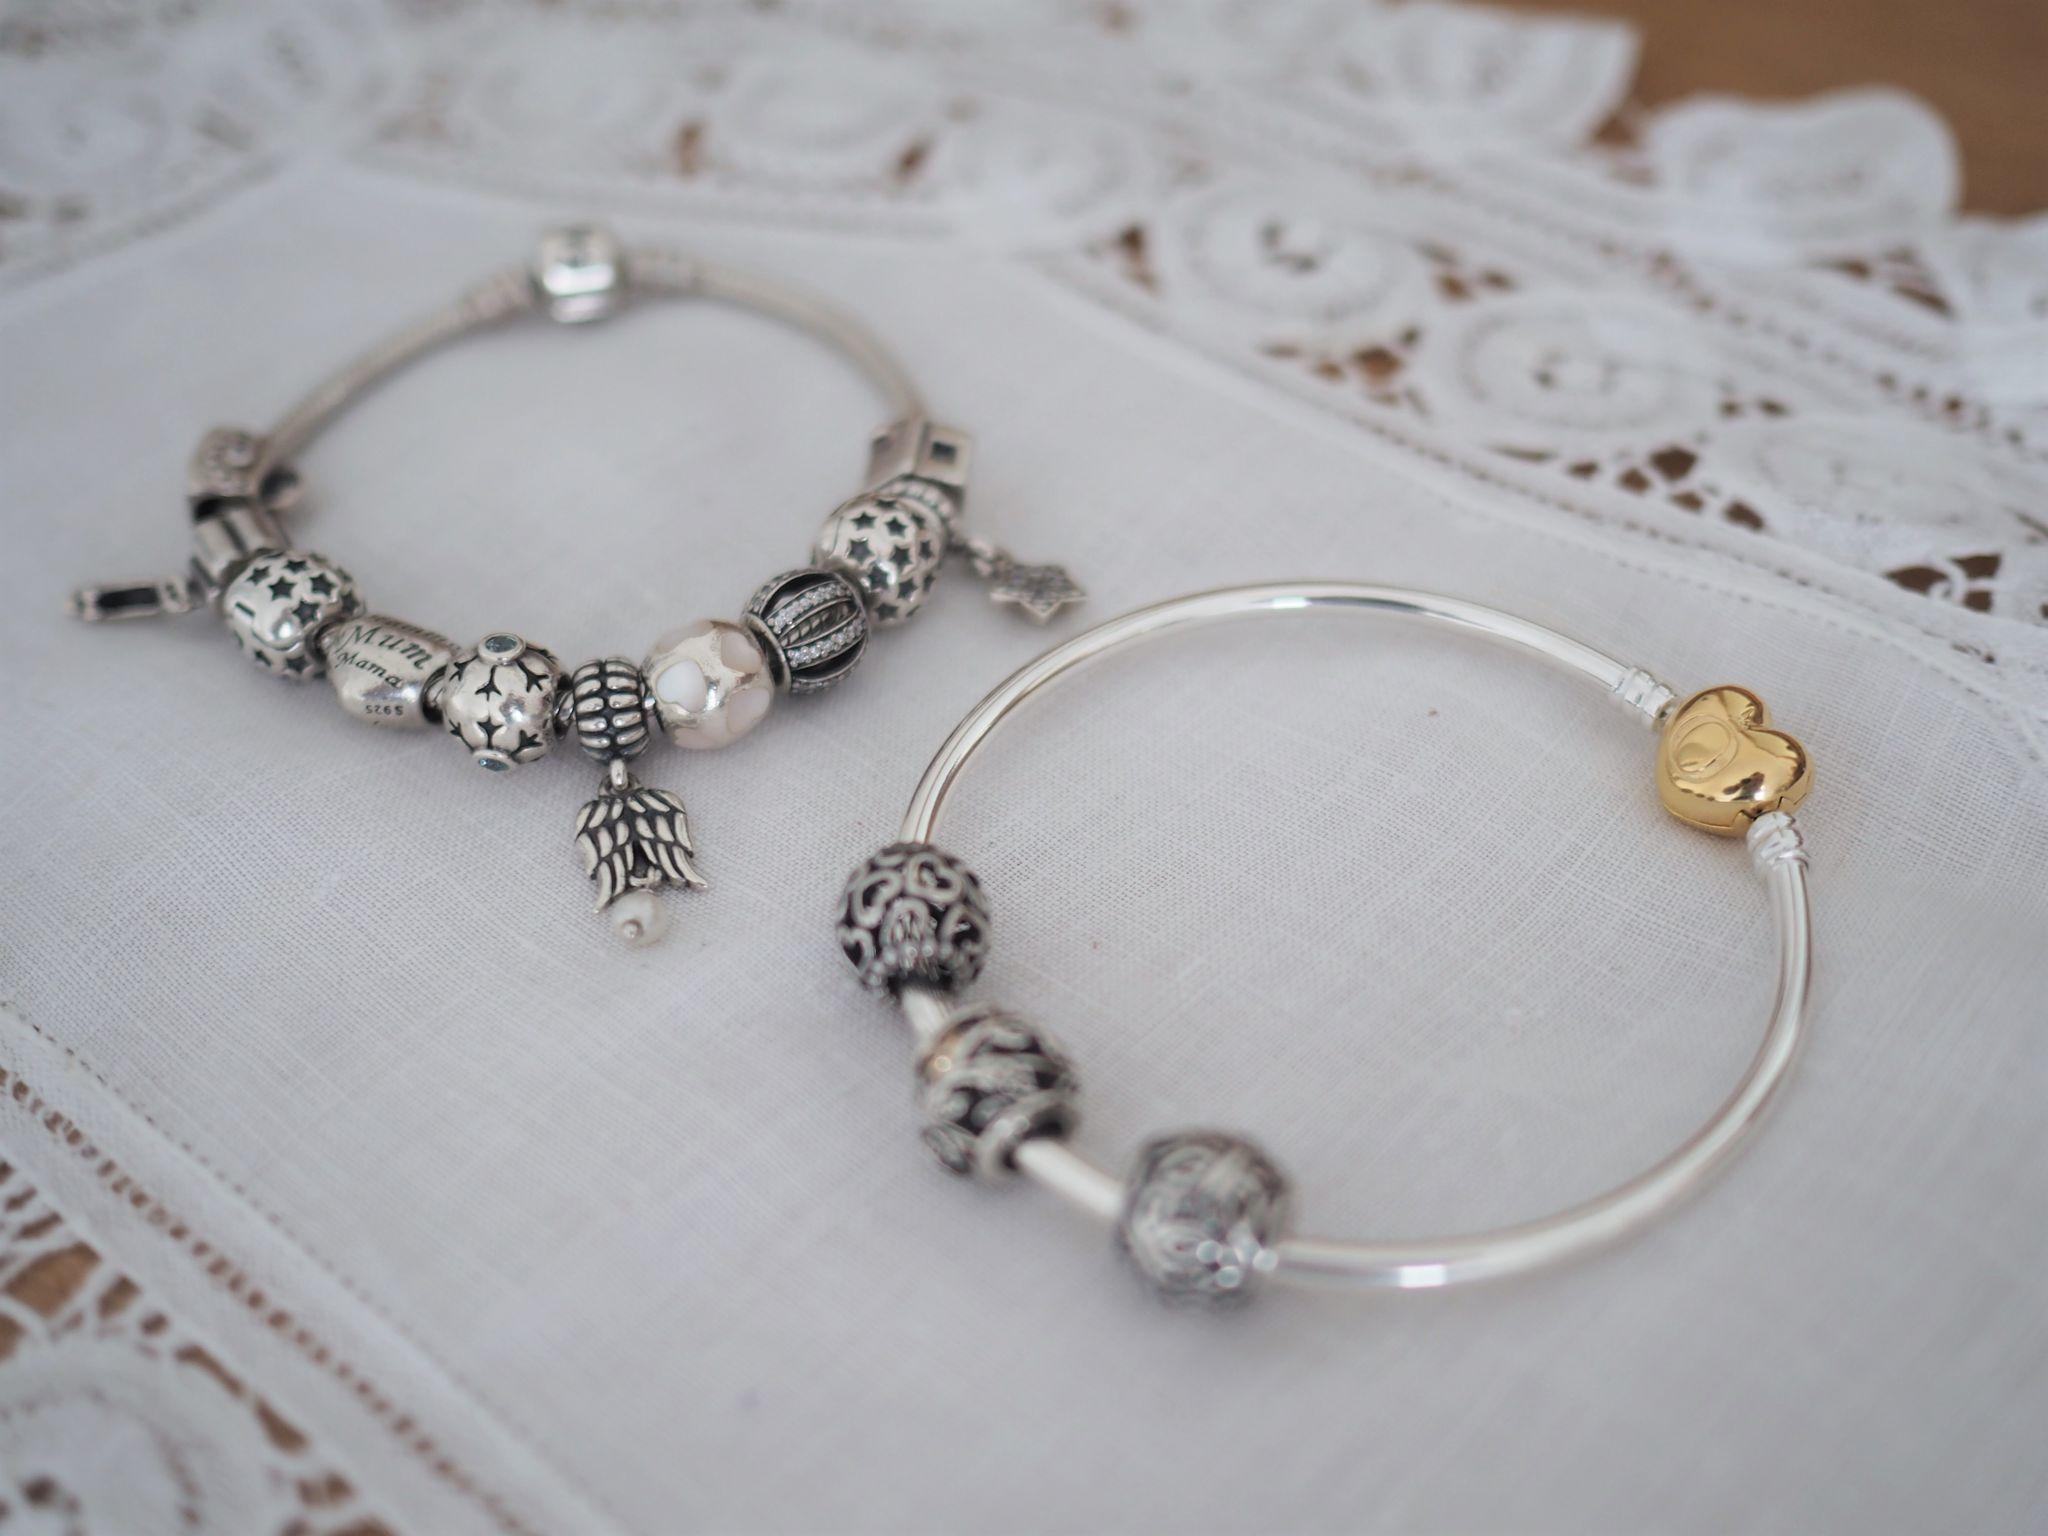 Pandora bracelet and bangle with charms